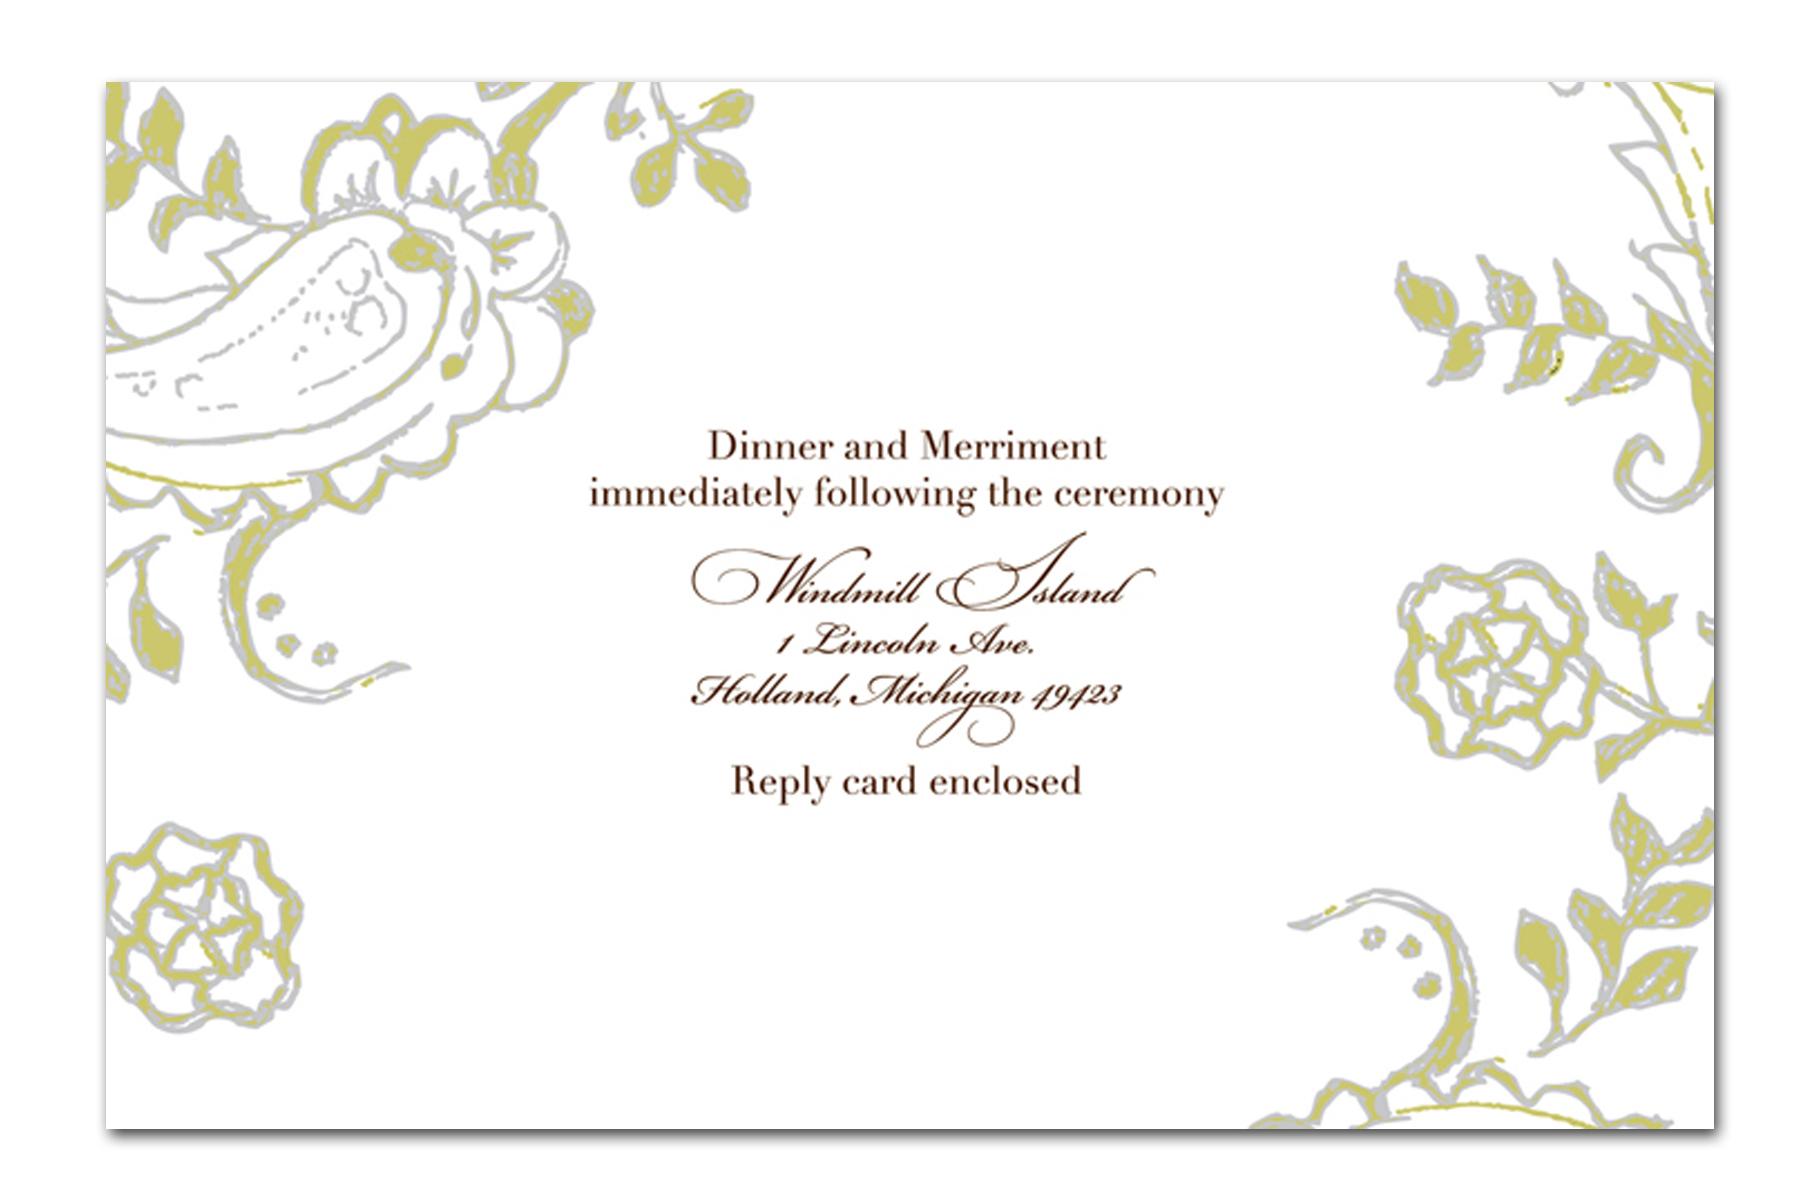 19 wedding invitation cards templates designs images wedding invitation card design wedding invitation templates and wedding invitation cards designs templates newdesignfile com